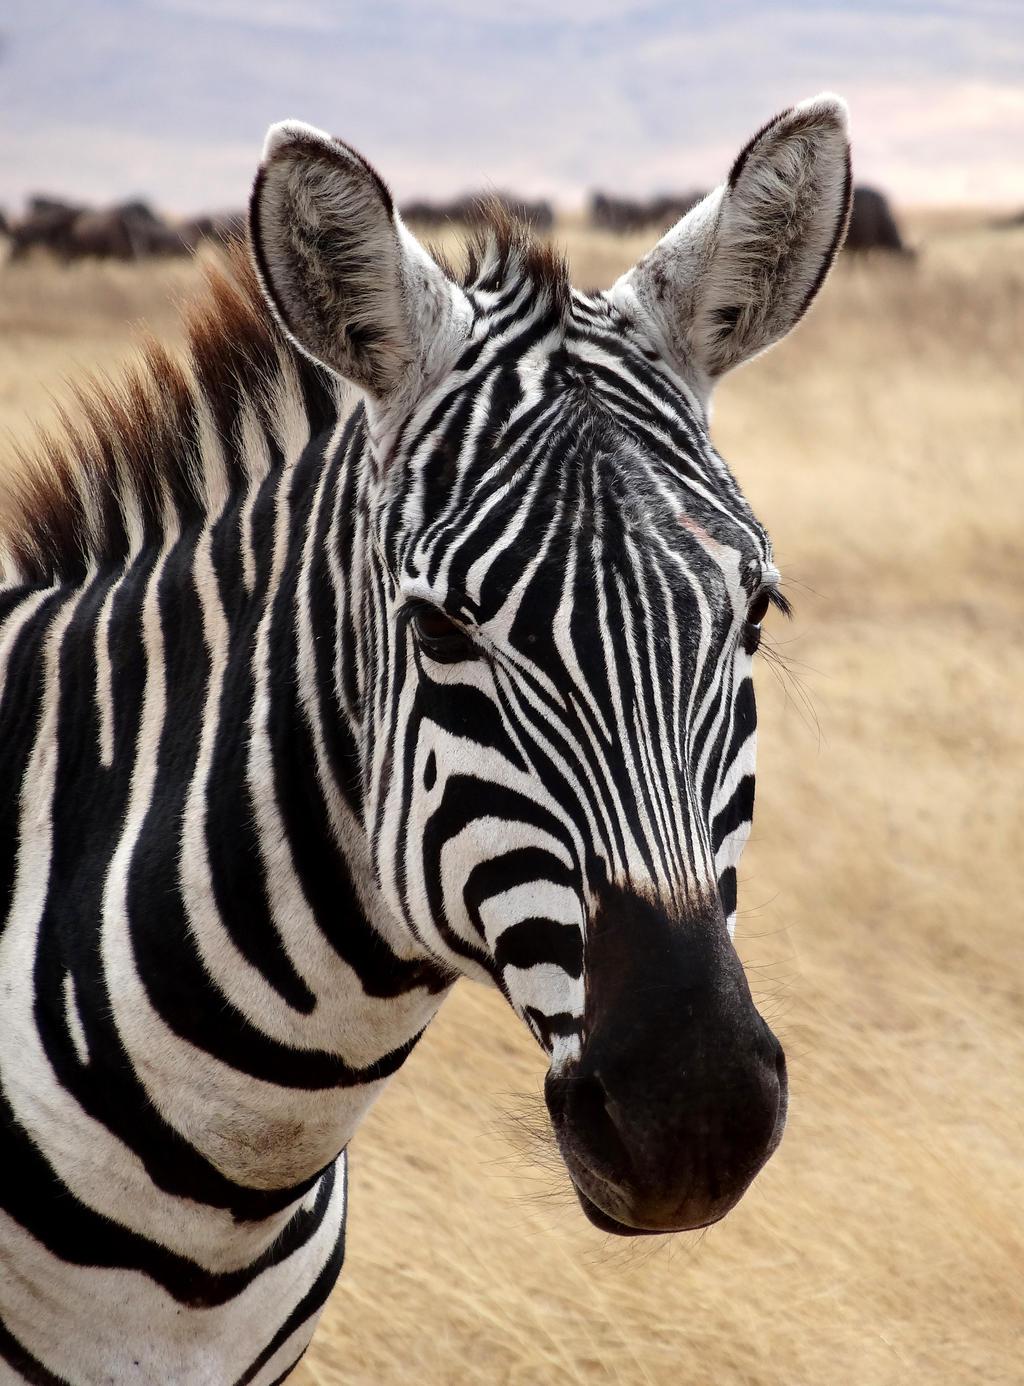 nopeus dating Zebra Augsburg Lesbo dating Cambridge UK